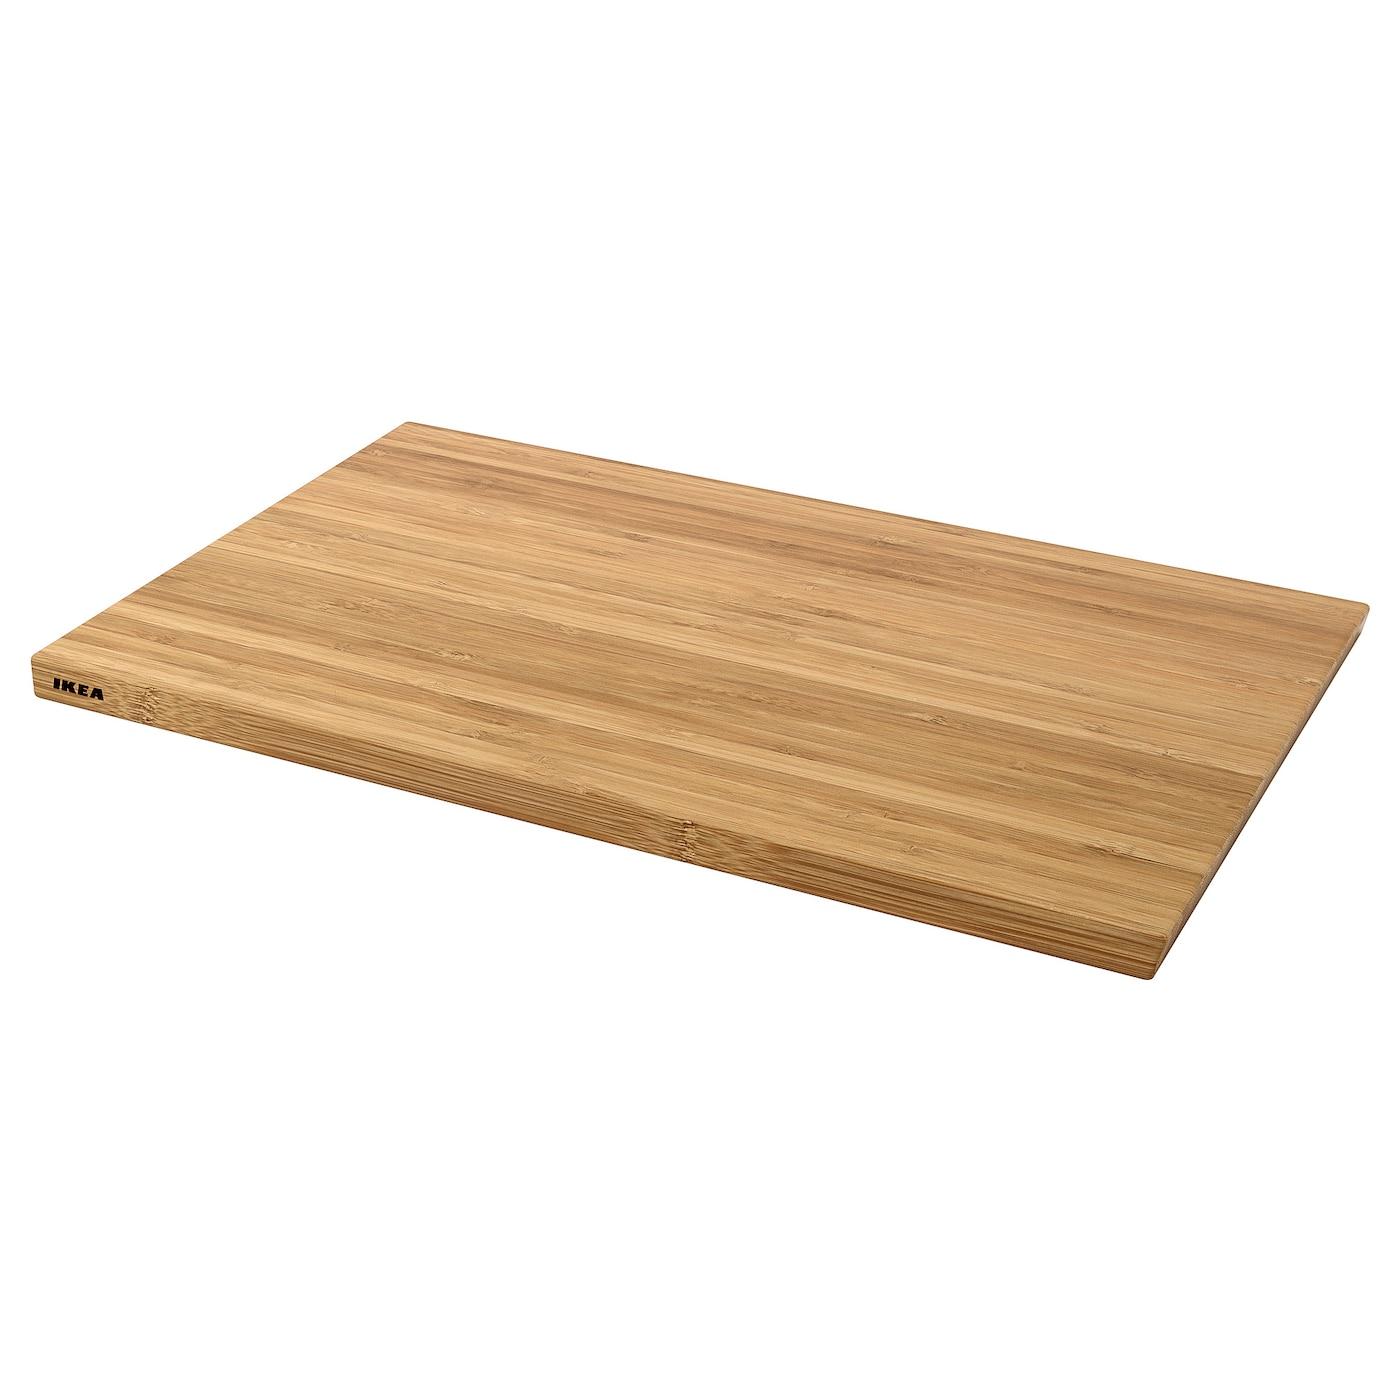 APTITLIG アプティートリグ まな板